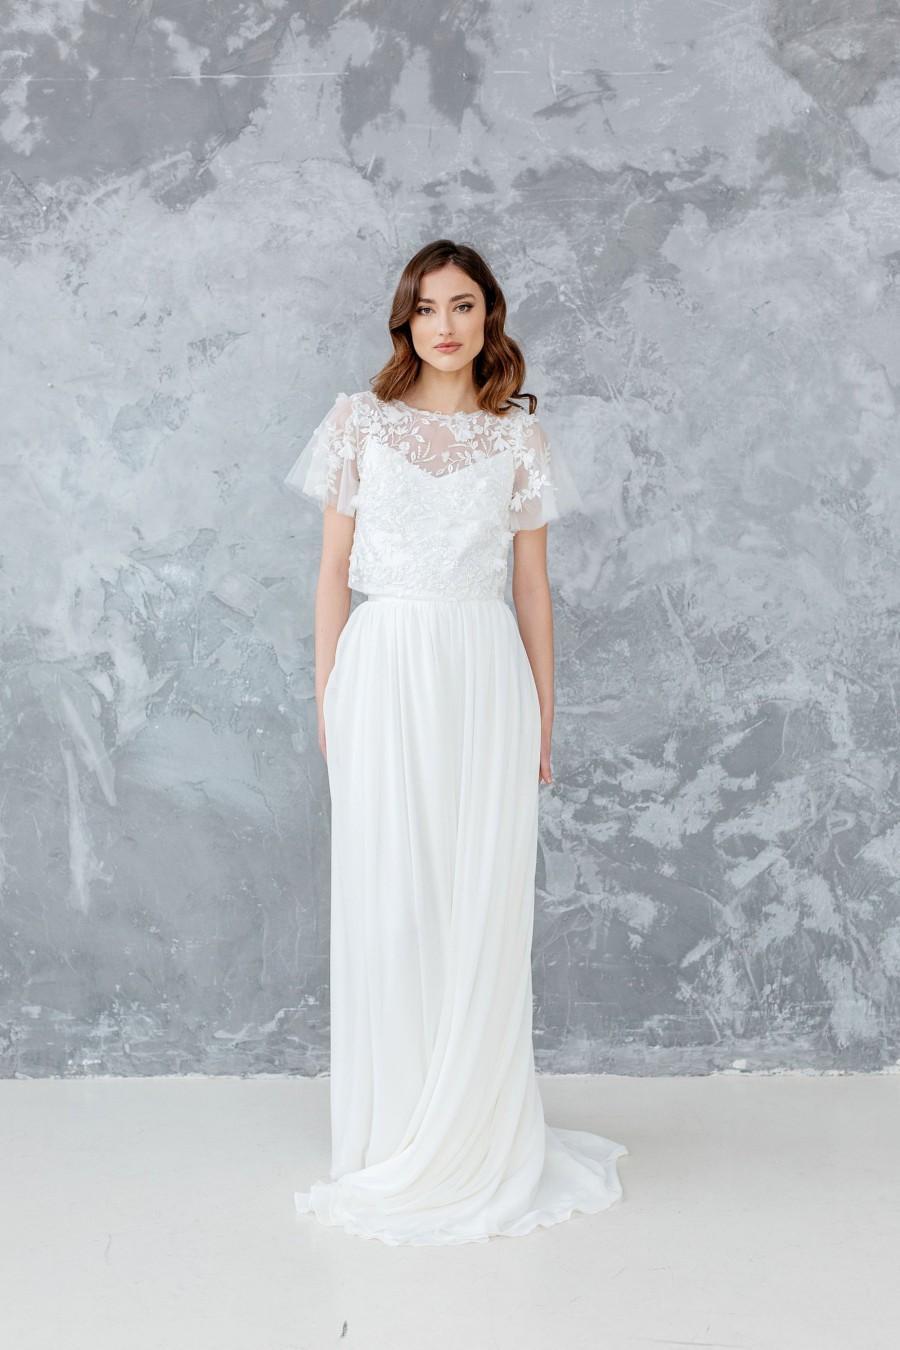 Mariage - Chiffon Bridal Skirt, Maxi Wedding Skirt, Bridal Separates, Ivory Chiffon Wedding Skirt for Bride, Long Wedding Skirt with Train - AUGUSTE